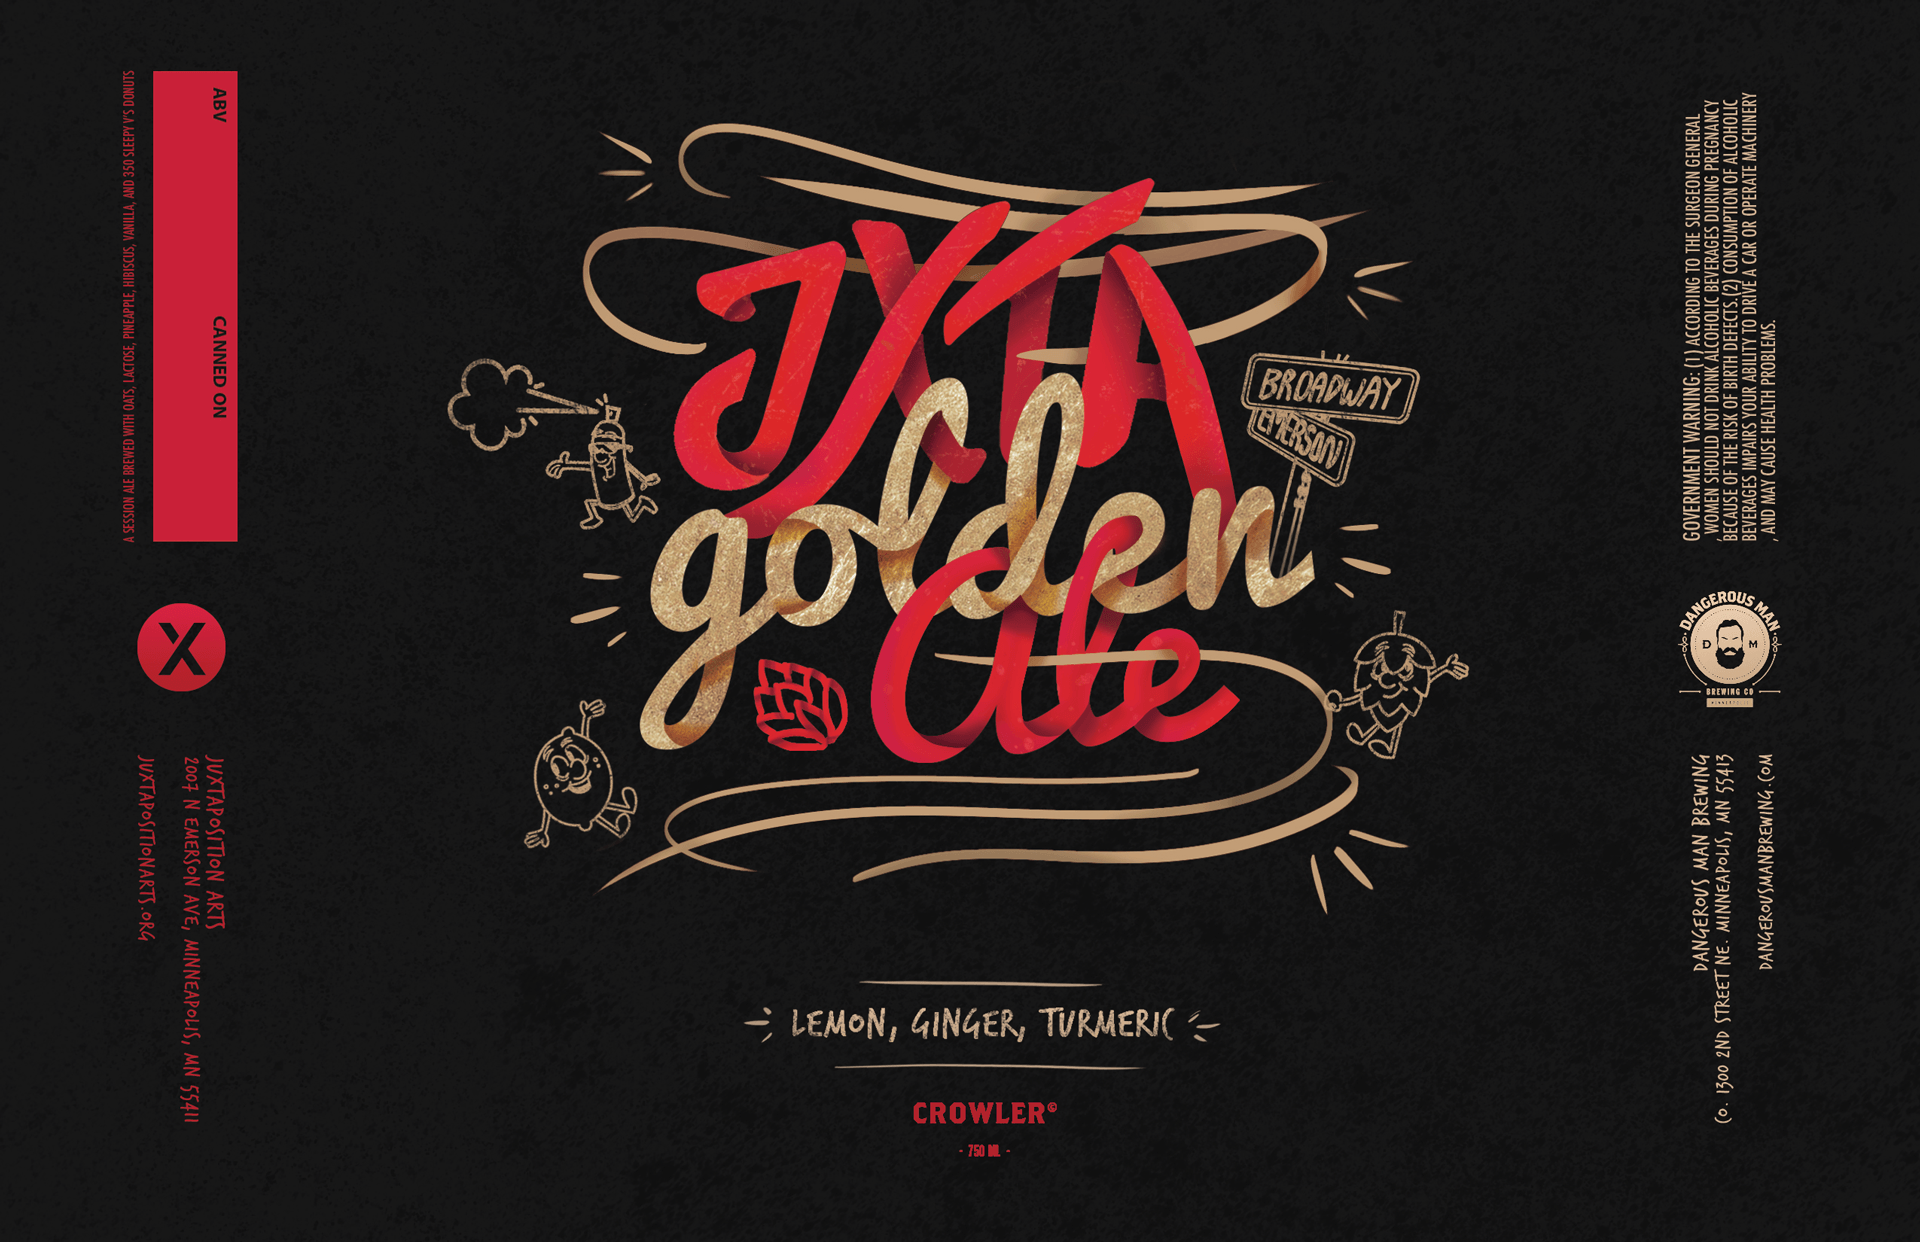 A digital rendering with the words JXTA golden ale illustratively designed